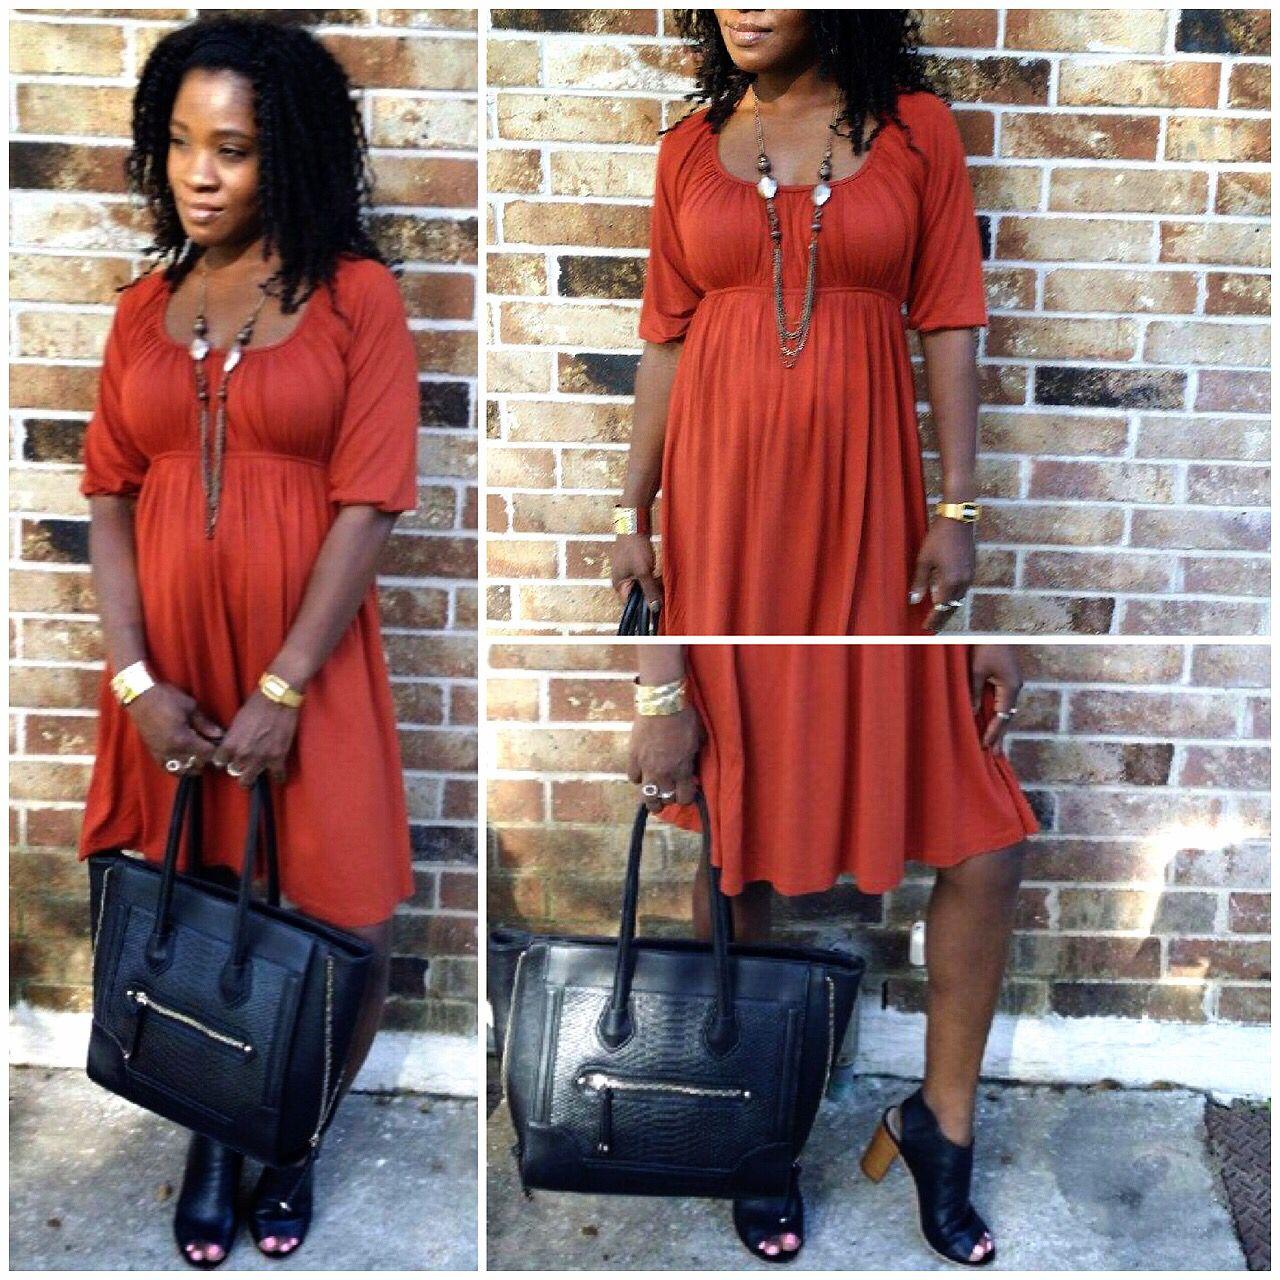 Cognac Mumu Dress Just in time for Fall.